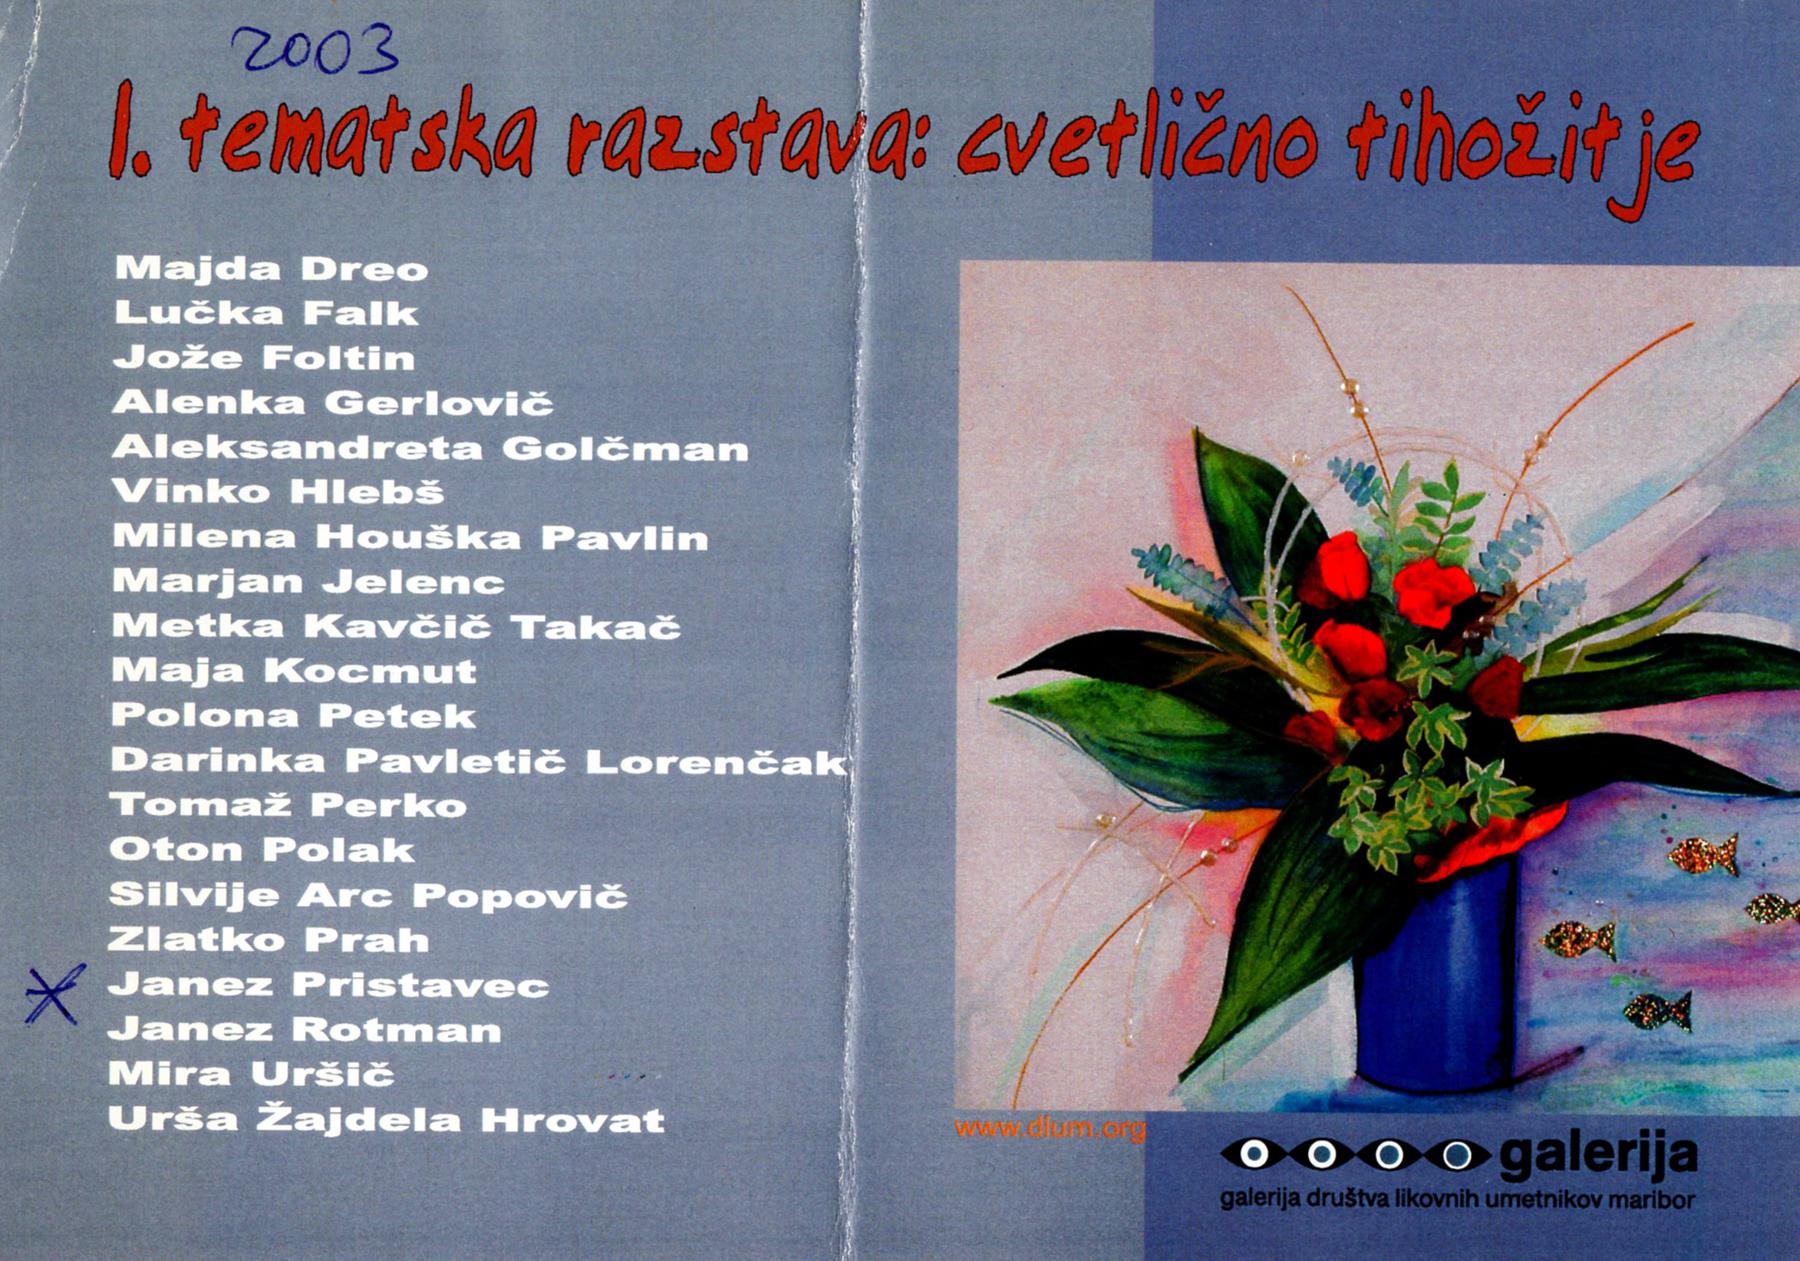 2003_dlum_tematska_razstava_tihozitja_1.jpg